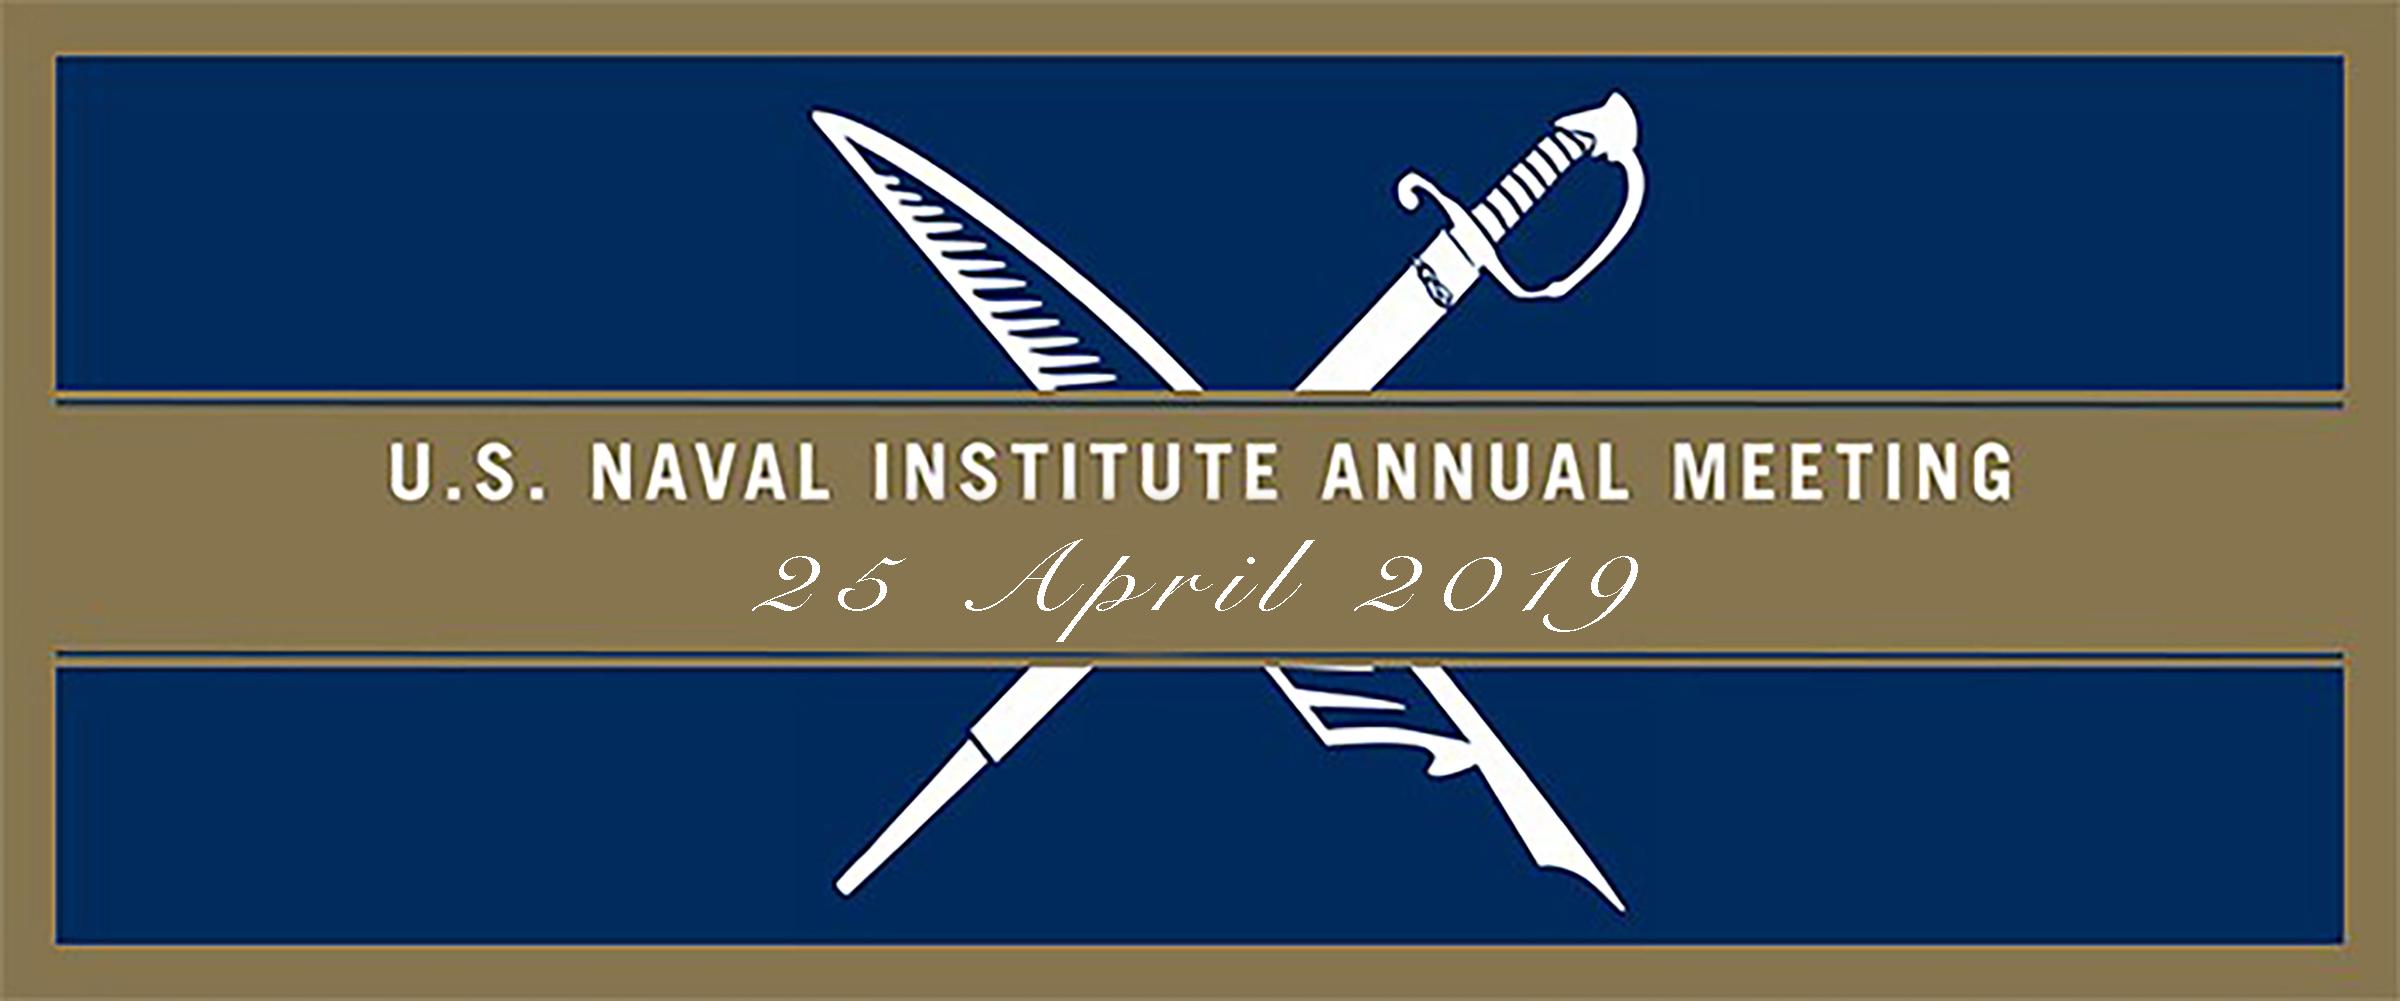 2019 U.S. Naval Institute Annual Meeting